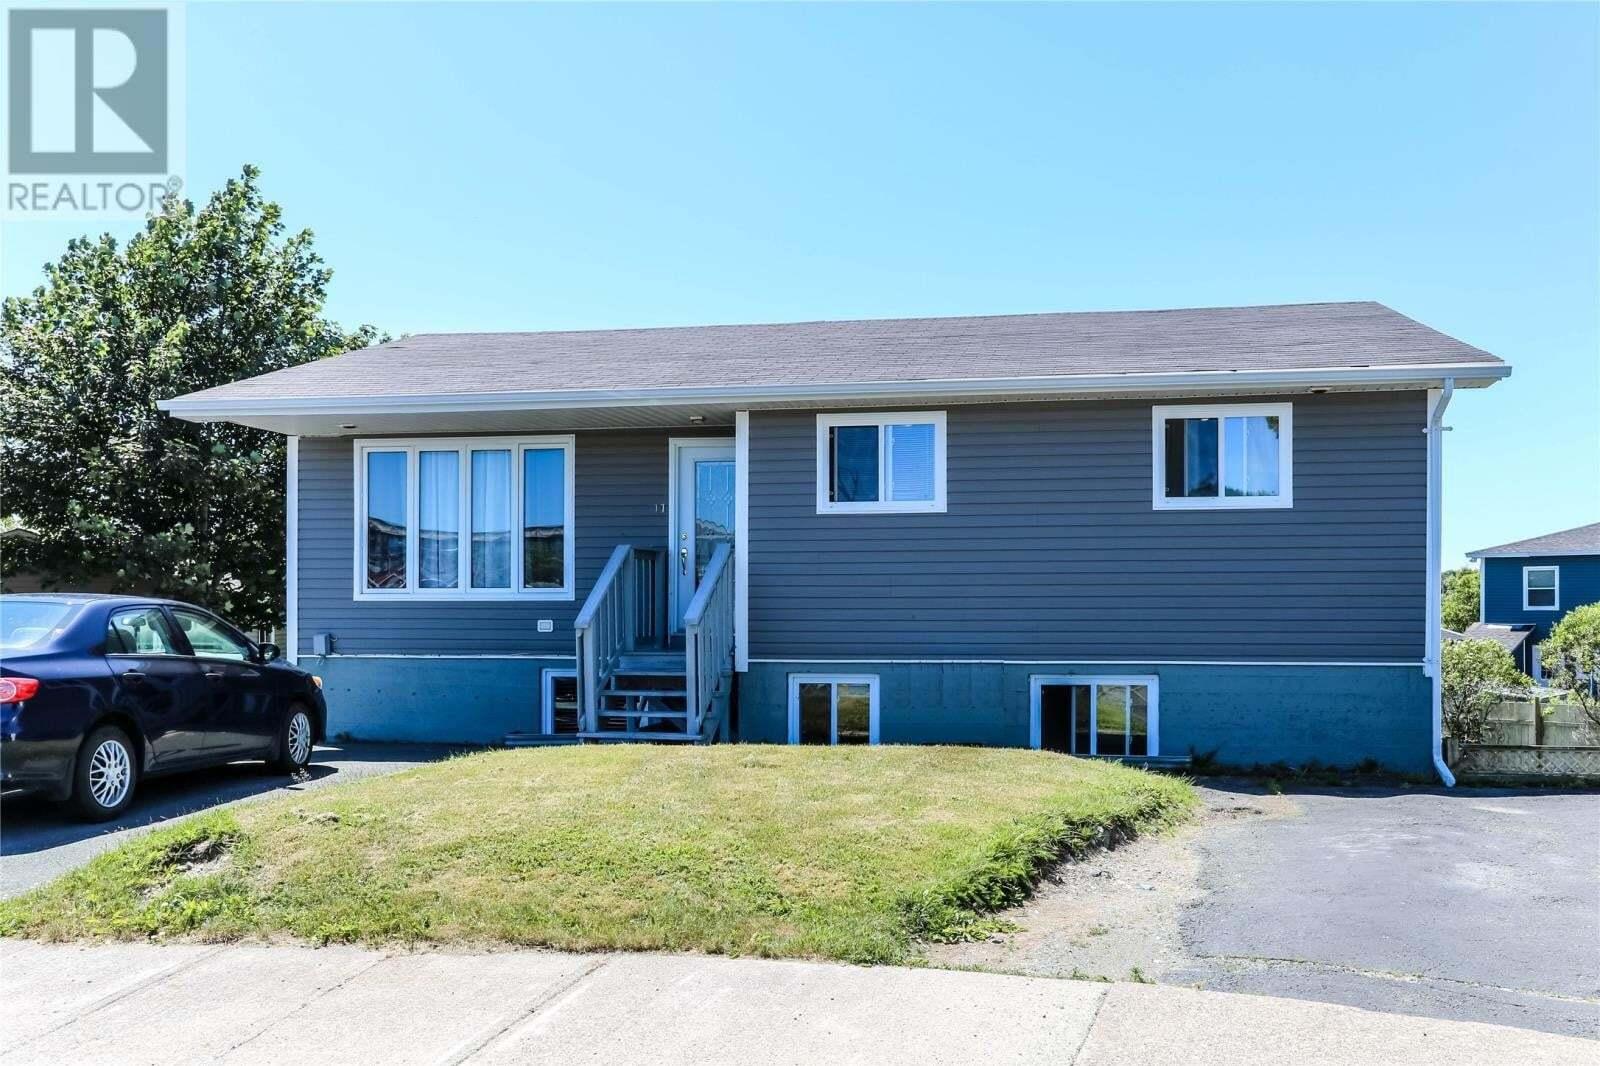 House for sale at 11 Glover Pl St. John's Newfoundland - MLS: 1217161